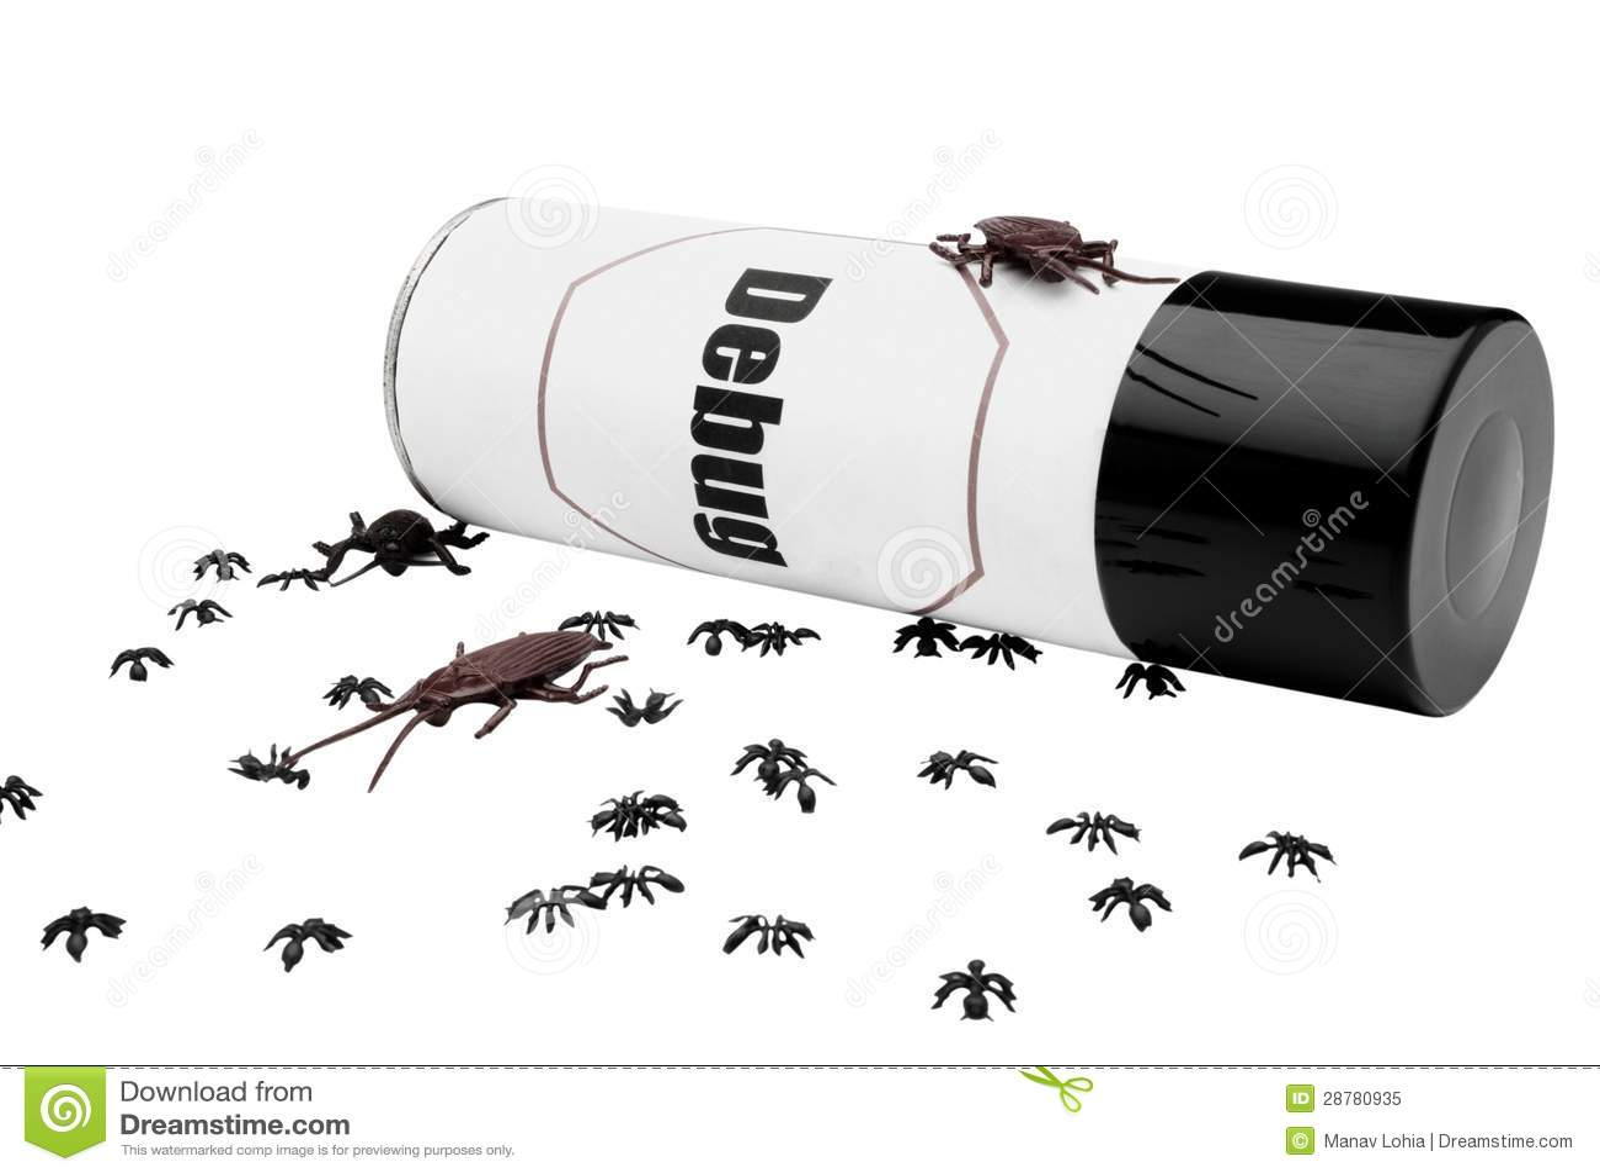 Mrówki i karakany zbliżają insekta repellent